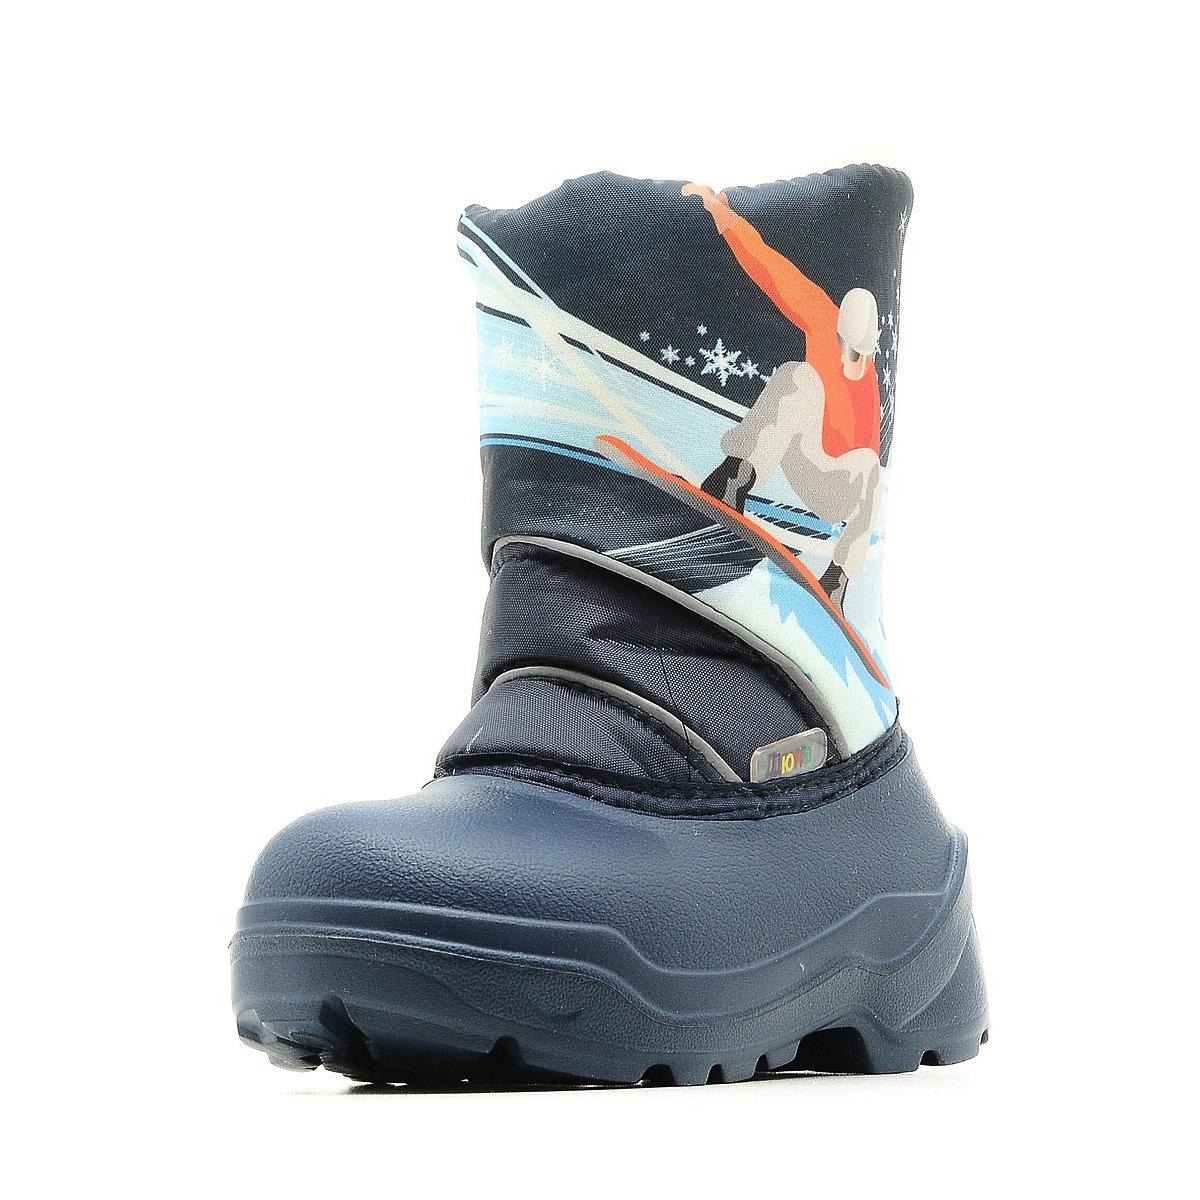 576-08 Сапоги Дюна Сноубутсы оптом, сноубордист/т.синий, размеры 27-33